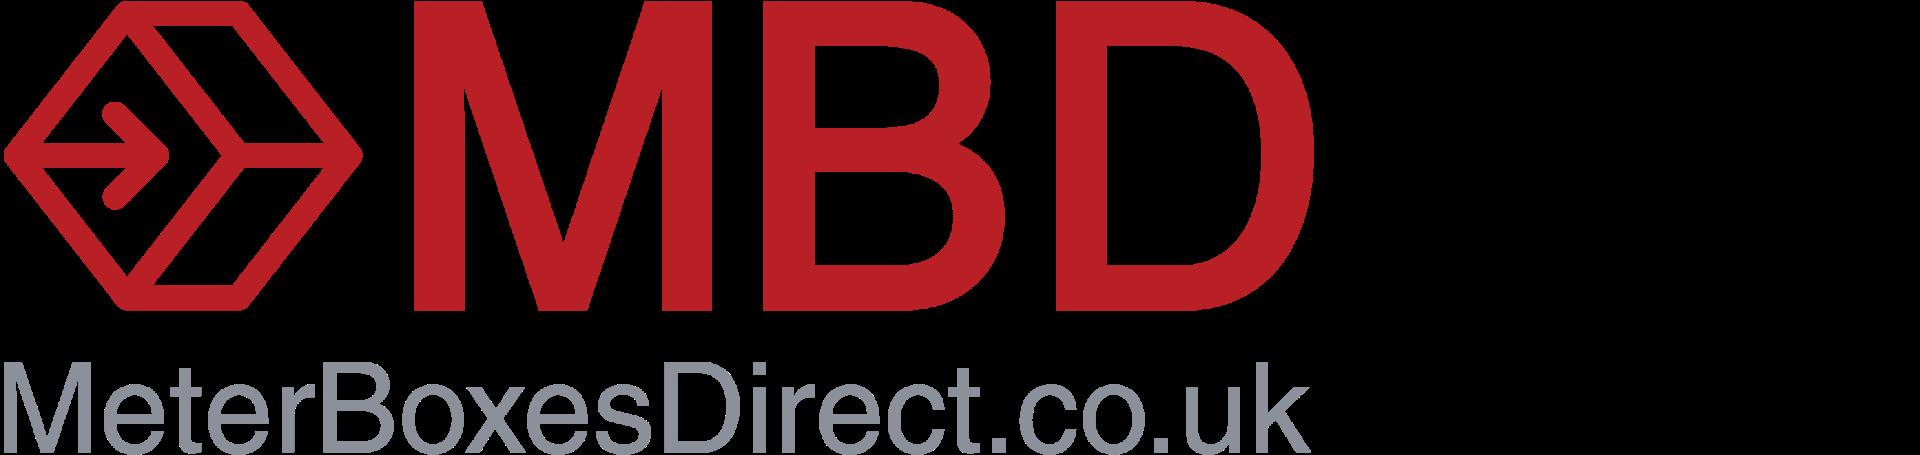 meterboxesdirect logo